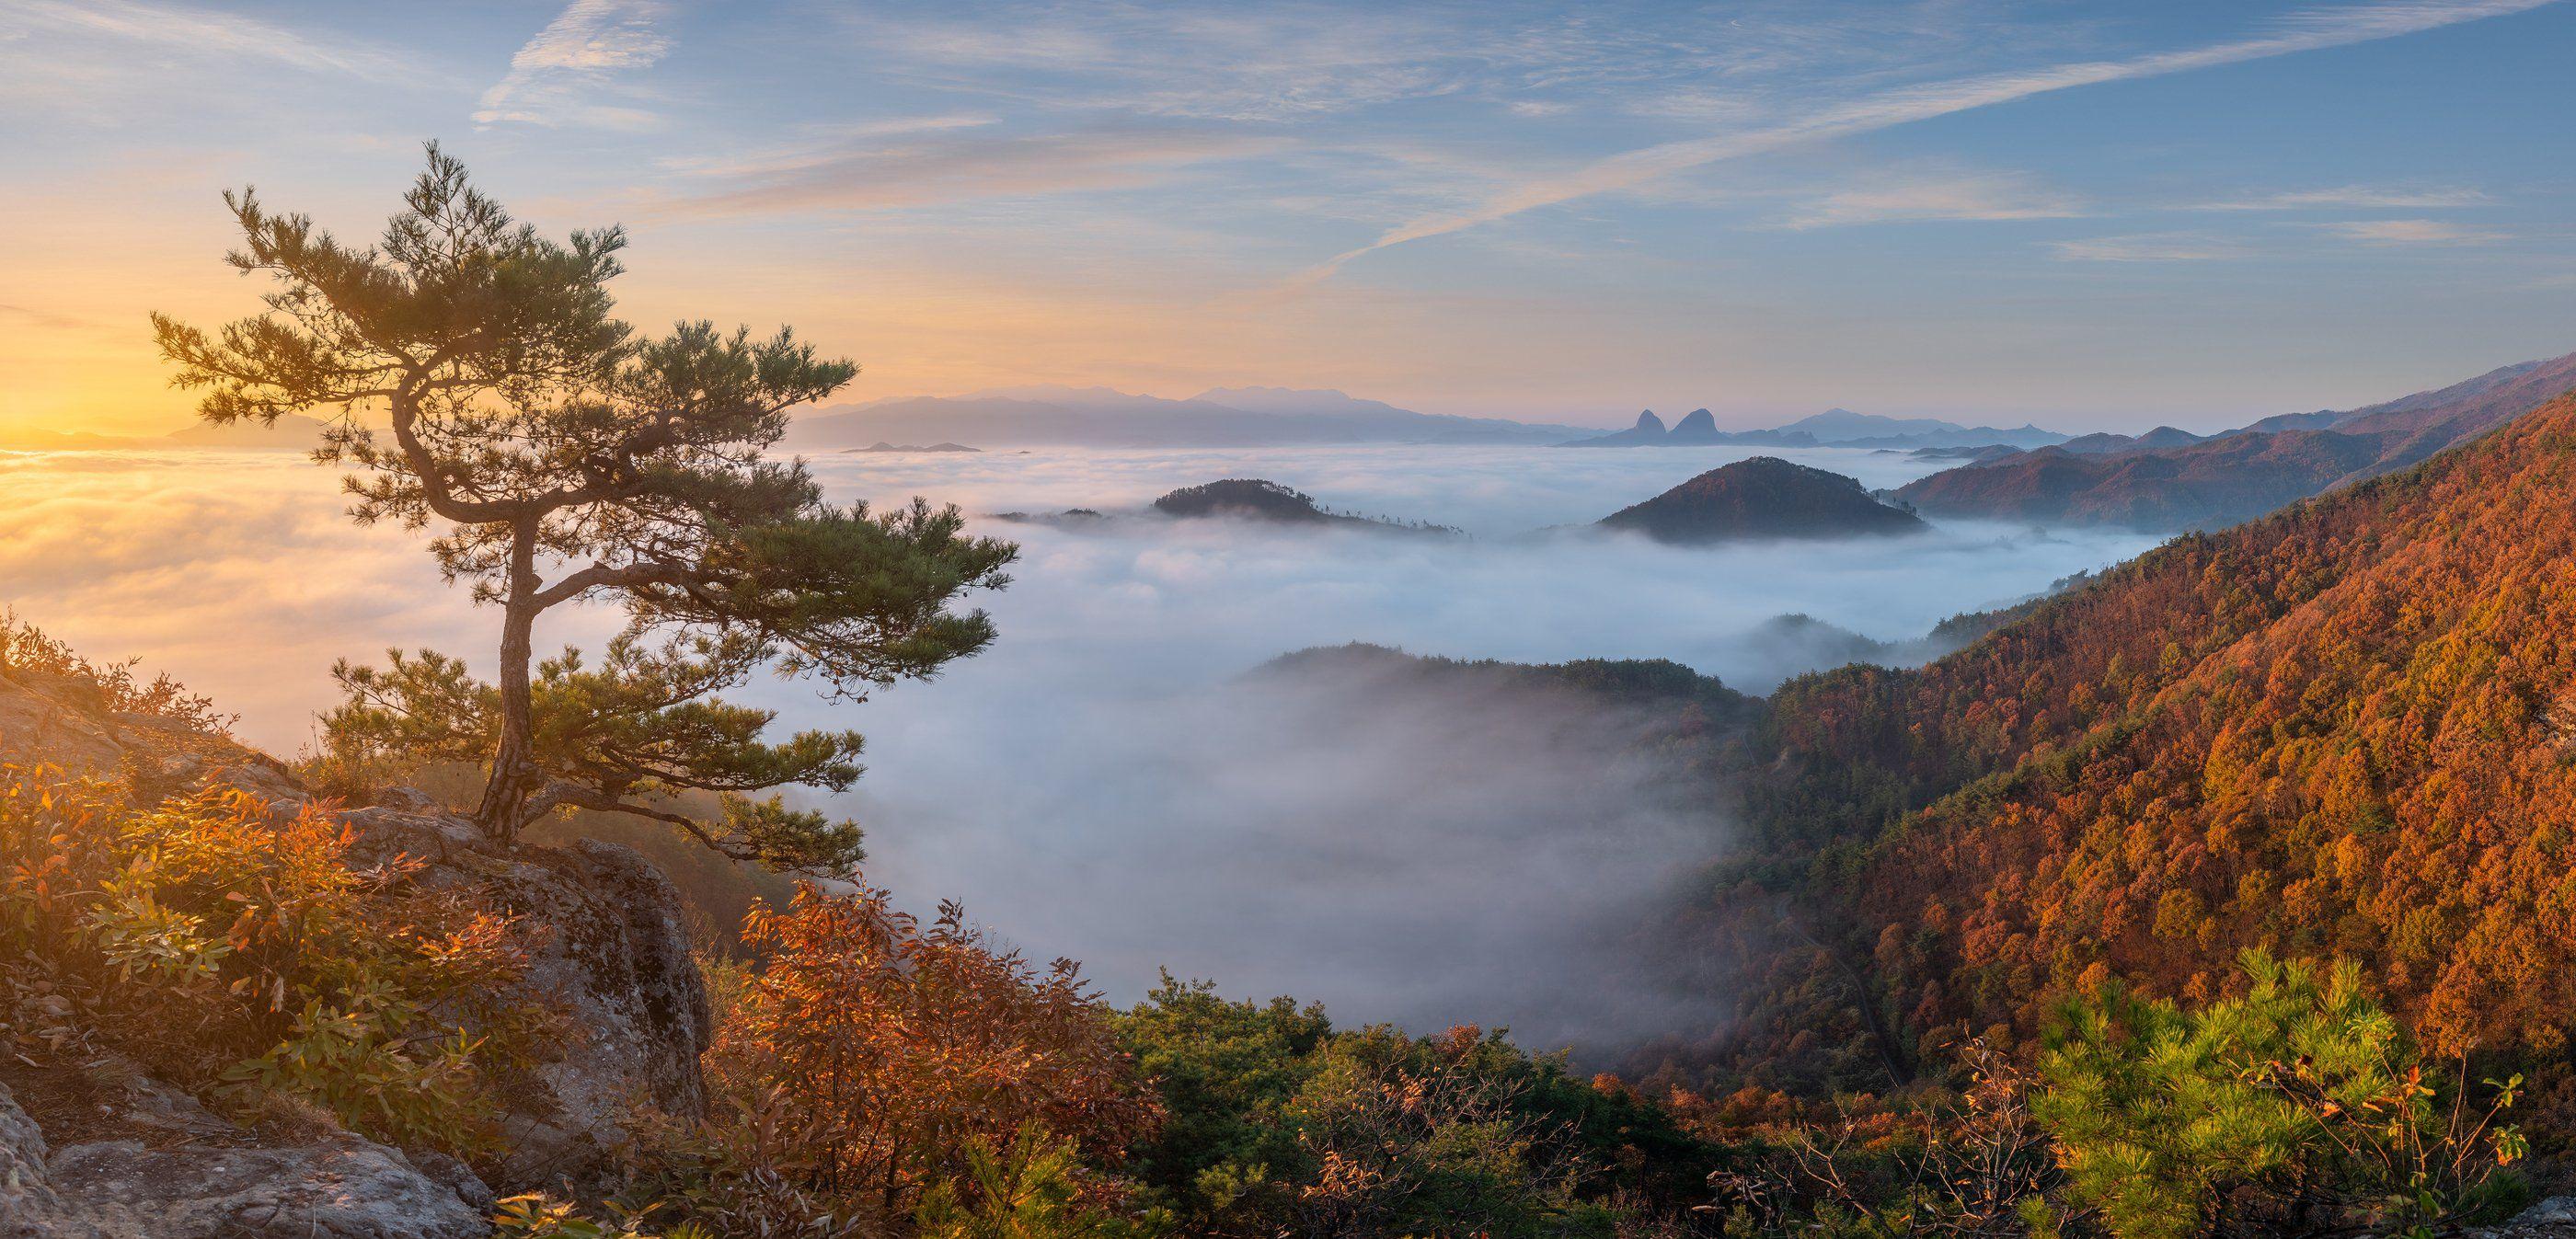 clouds, autumn, tree, mountains, dreamy, misty, pine, sunrise, 류재윤